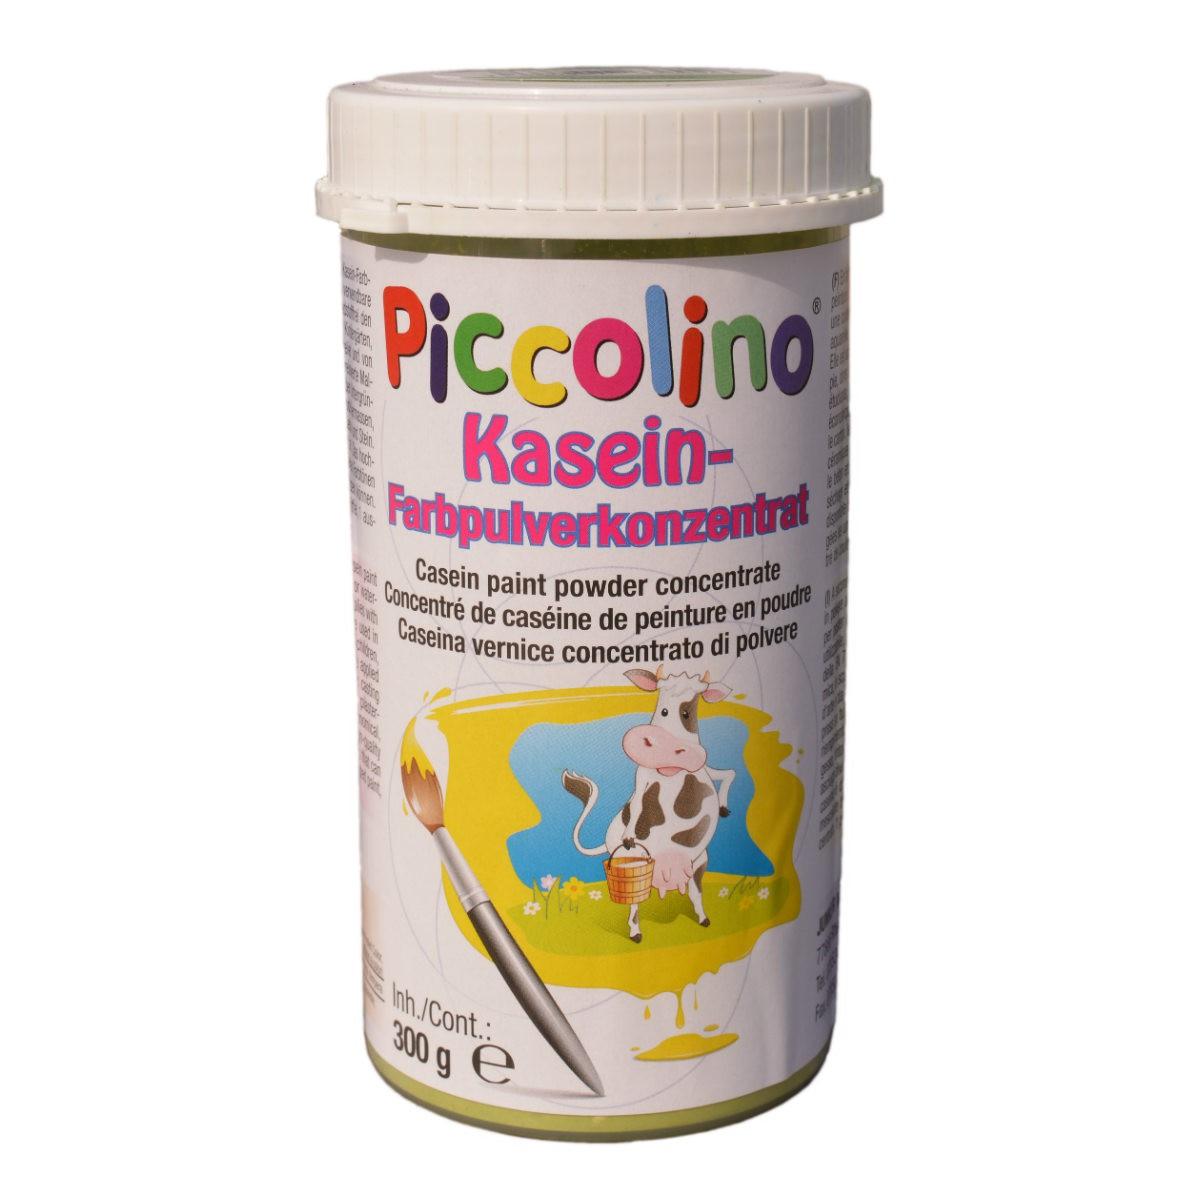 Plakatfarbe Piccolino Kaseinfarbe 300g schwarz - Farbpulver zum Selbstanrühren